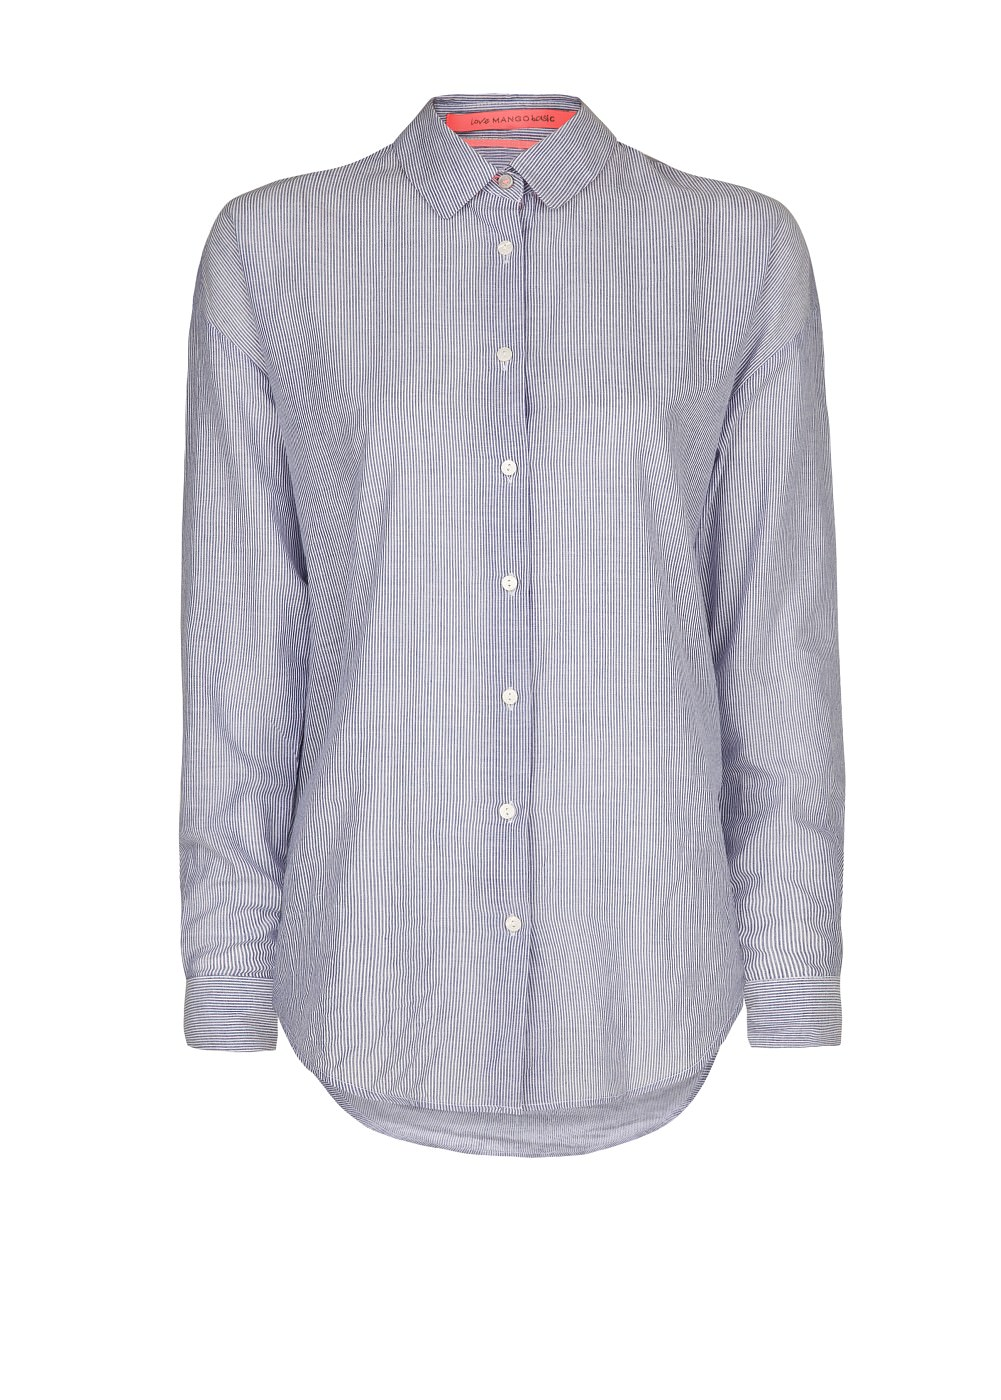 MANGO - CLOTHING - Tops - Striped cotton shirt